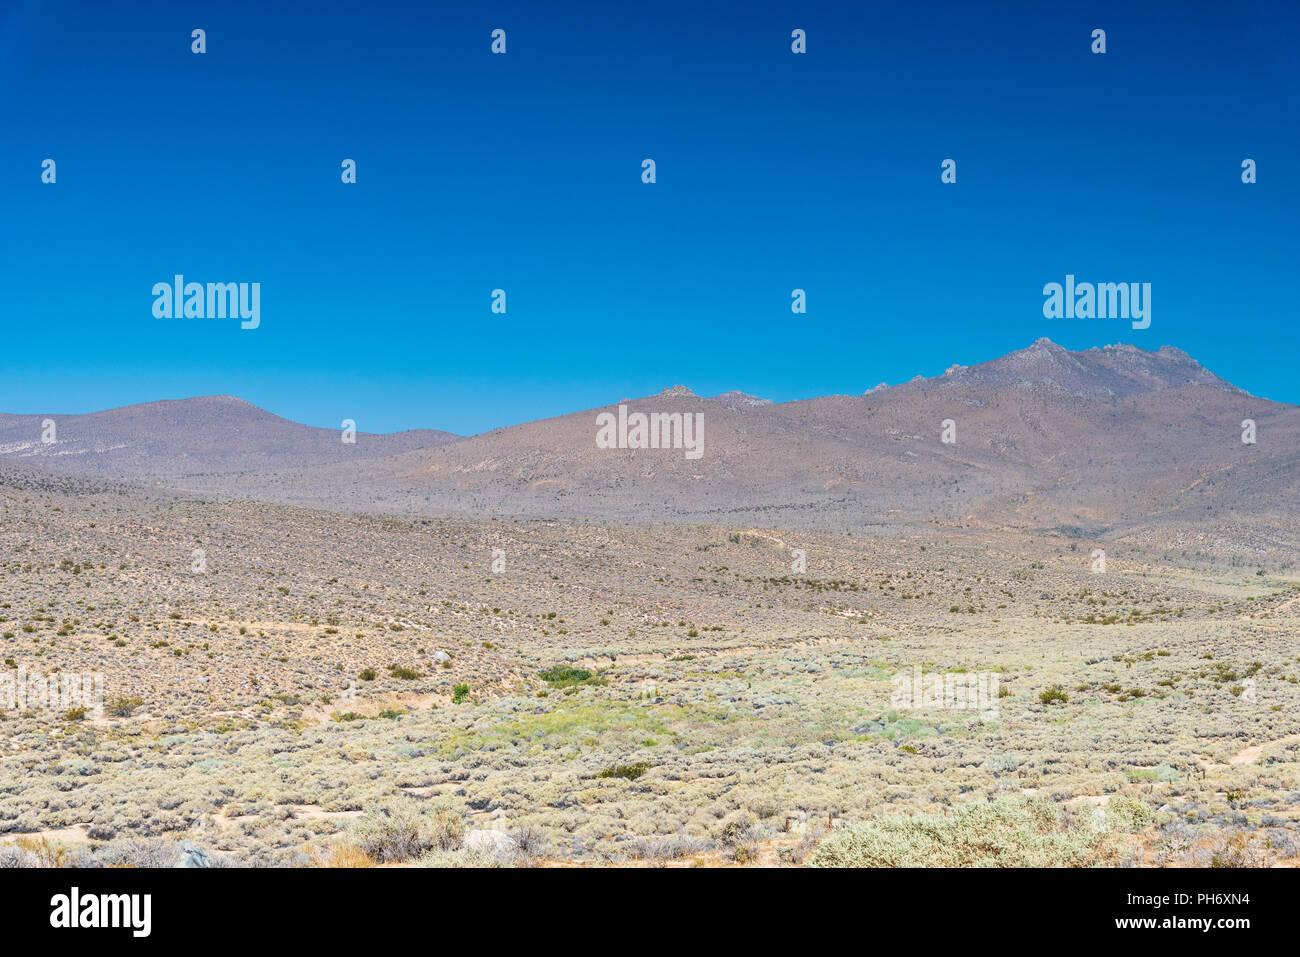 'Vast desert valley with barren mountains under blue sky. - Stock Image